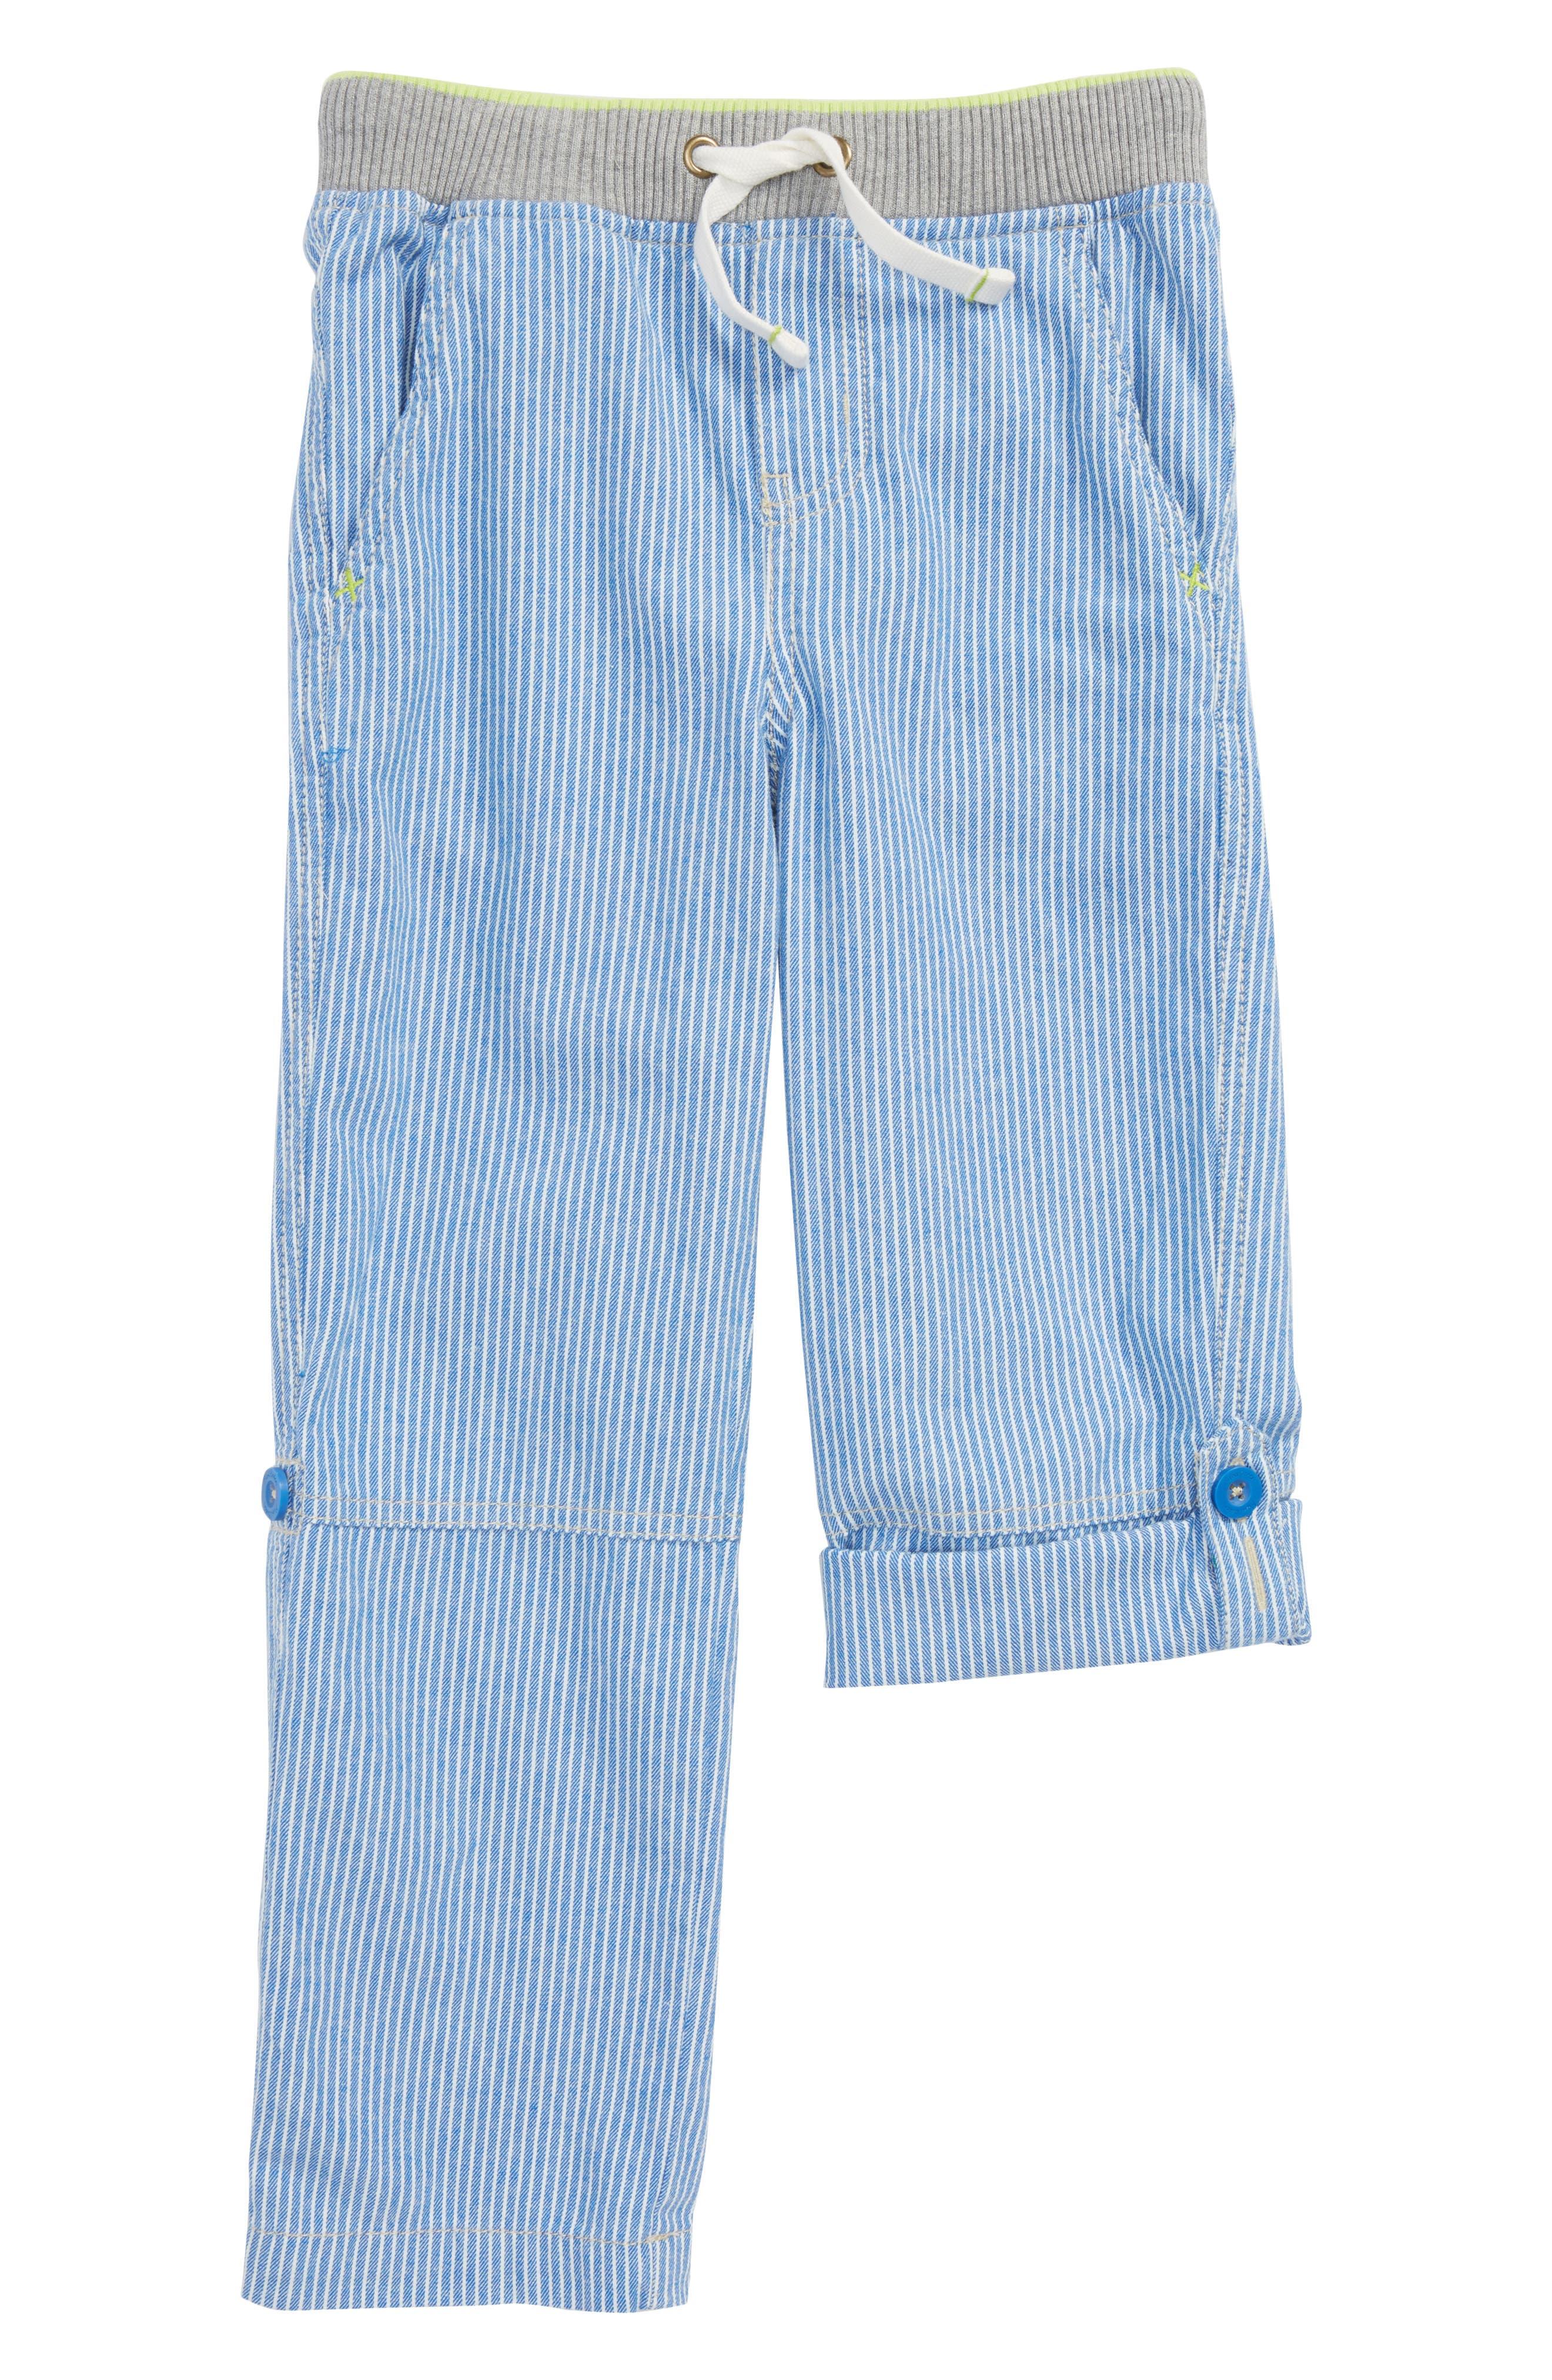 Surf Roll-Up Pants,                         Main,                         color, Skipper Blue/ Ecru